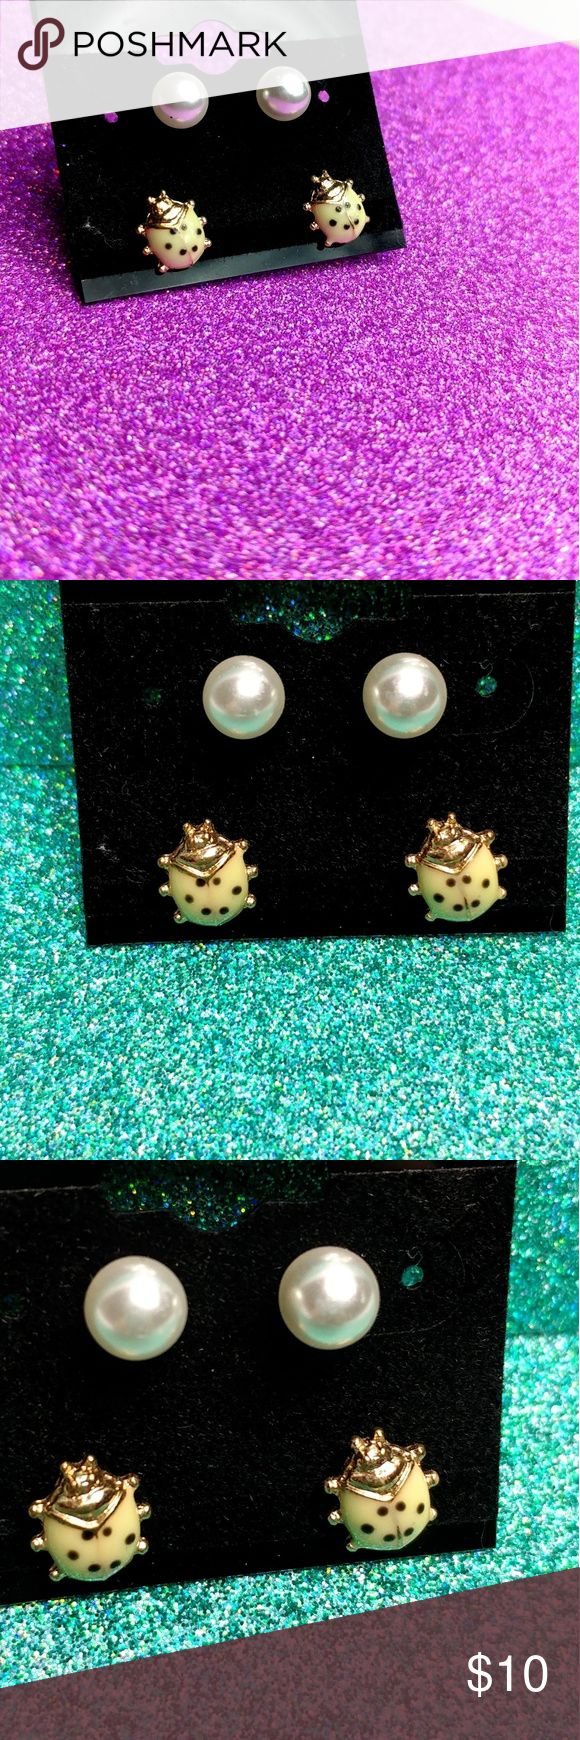 Sensitive Ears Pearl And Lady Bug Stud Earrings